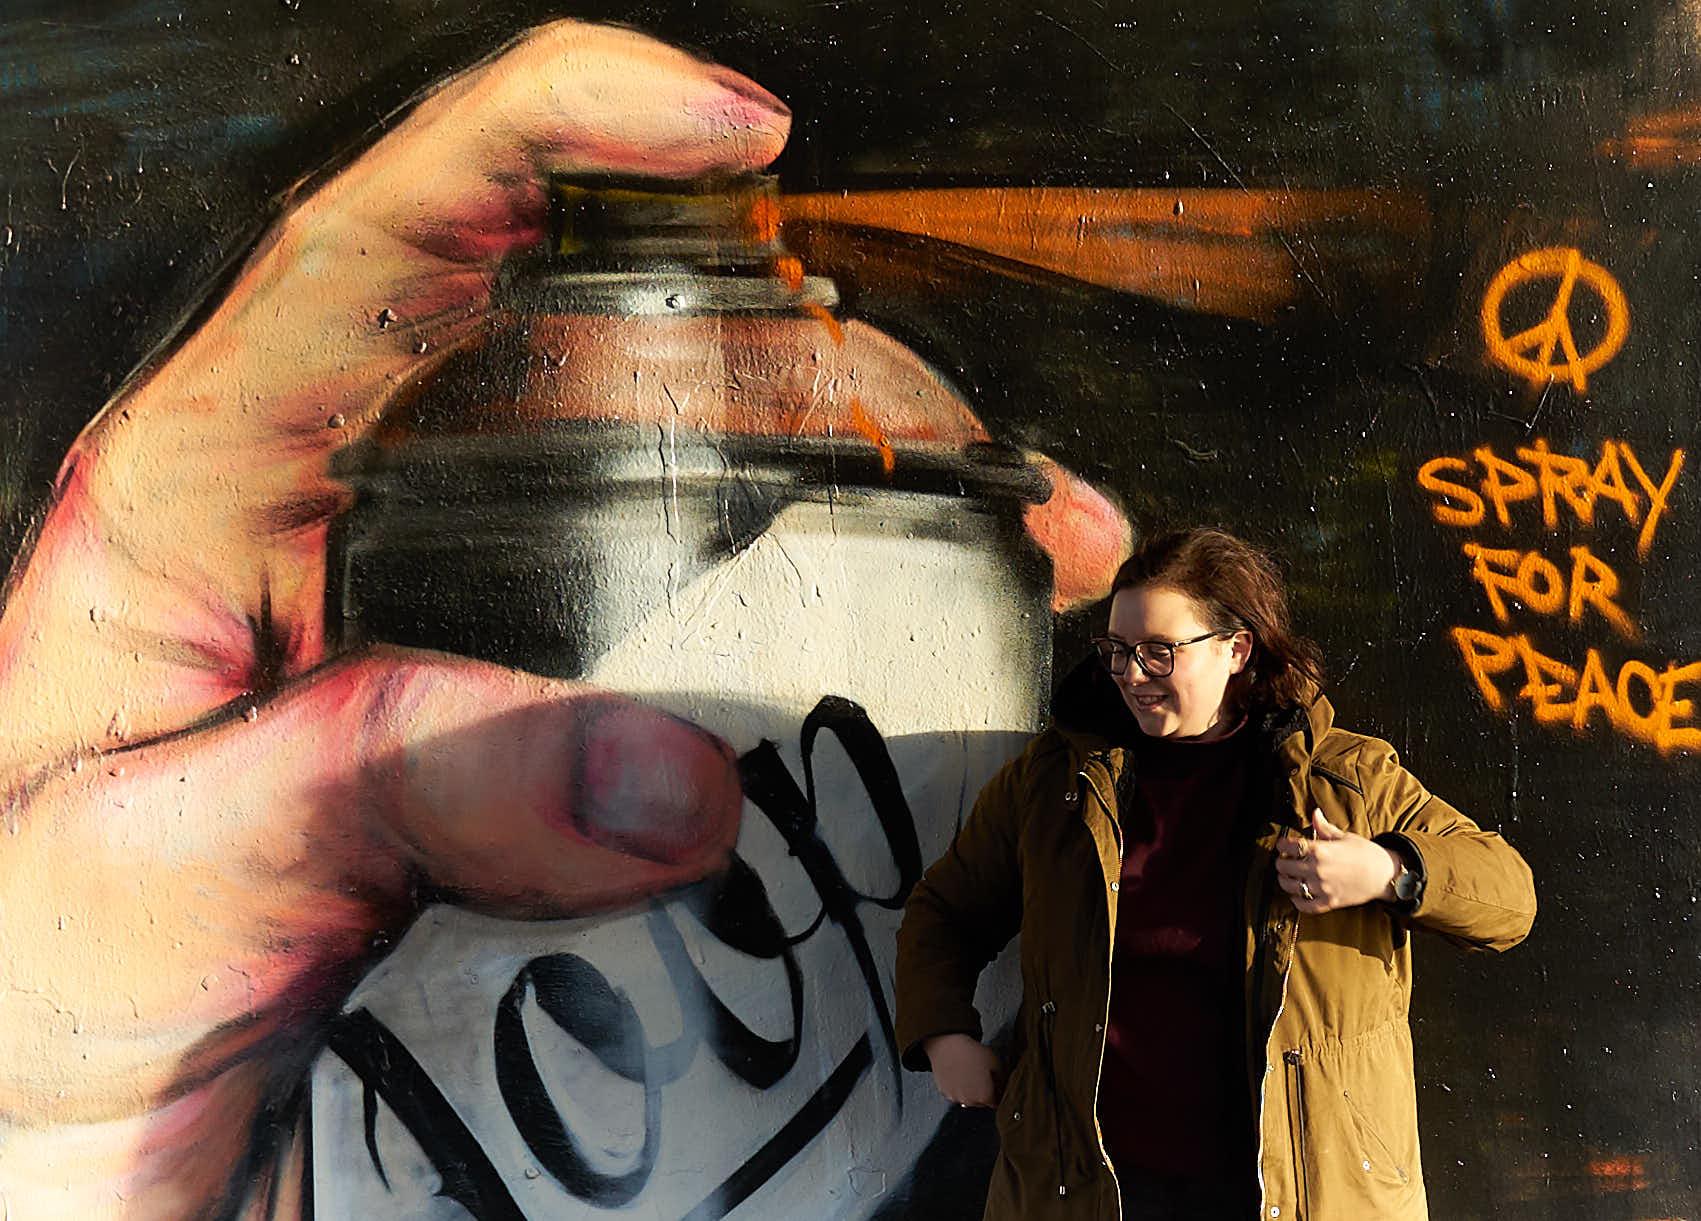 Streetart_Spray-for-peace_London_Shoreditch_me_kom.jpg